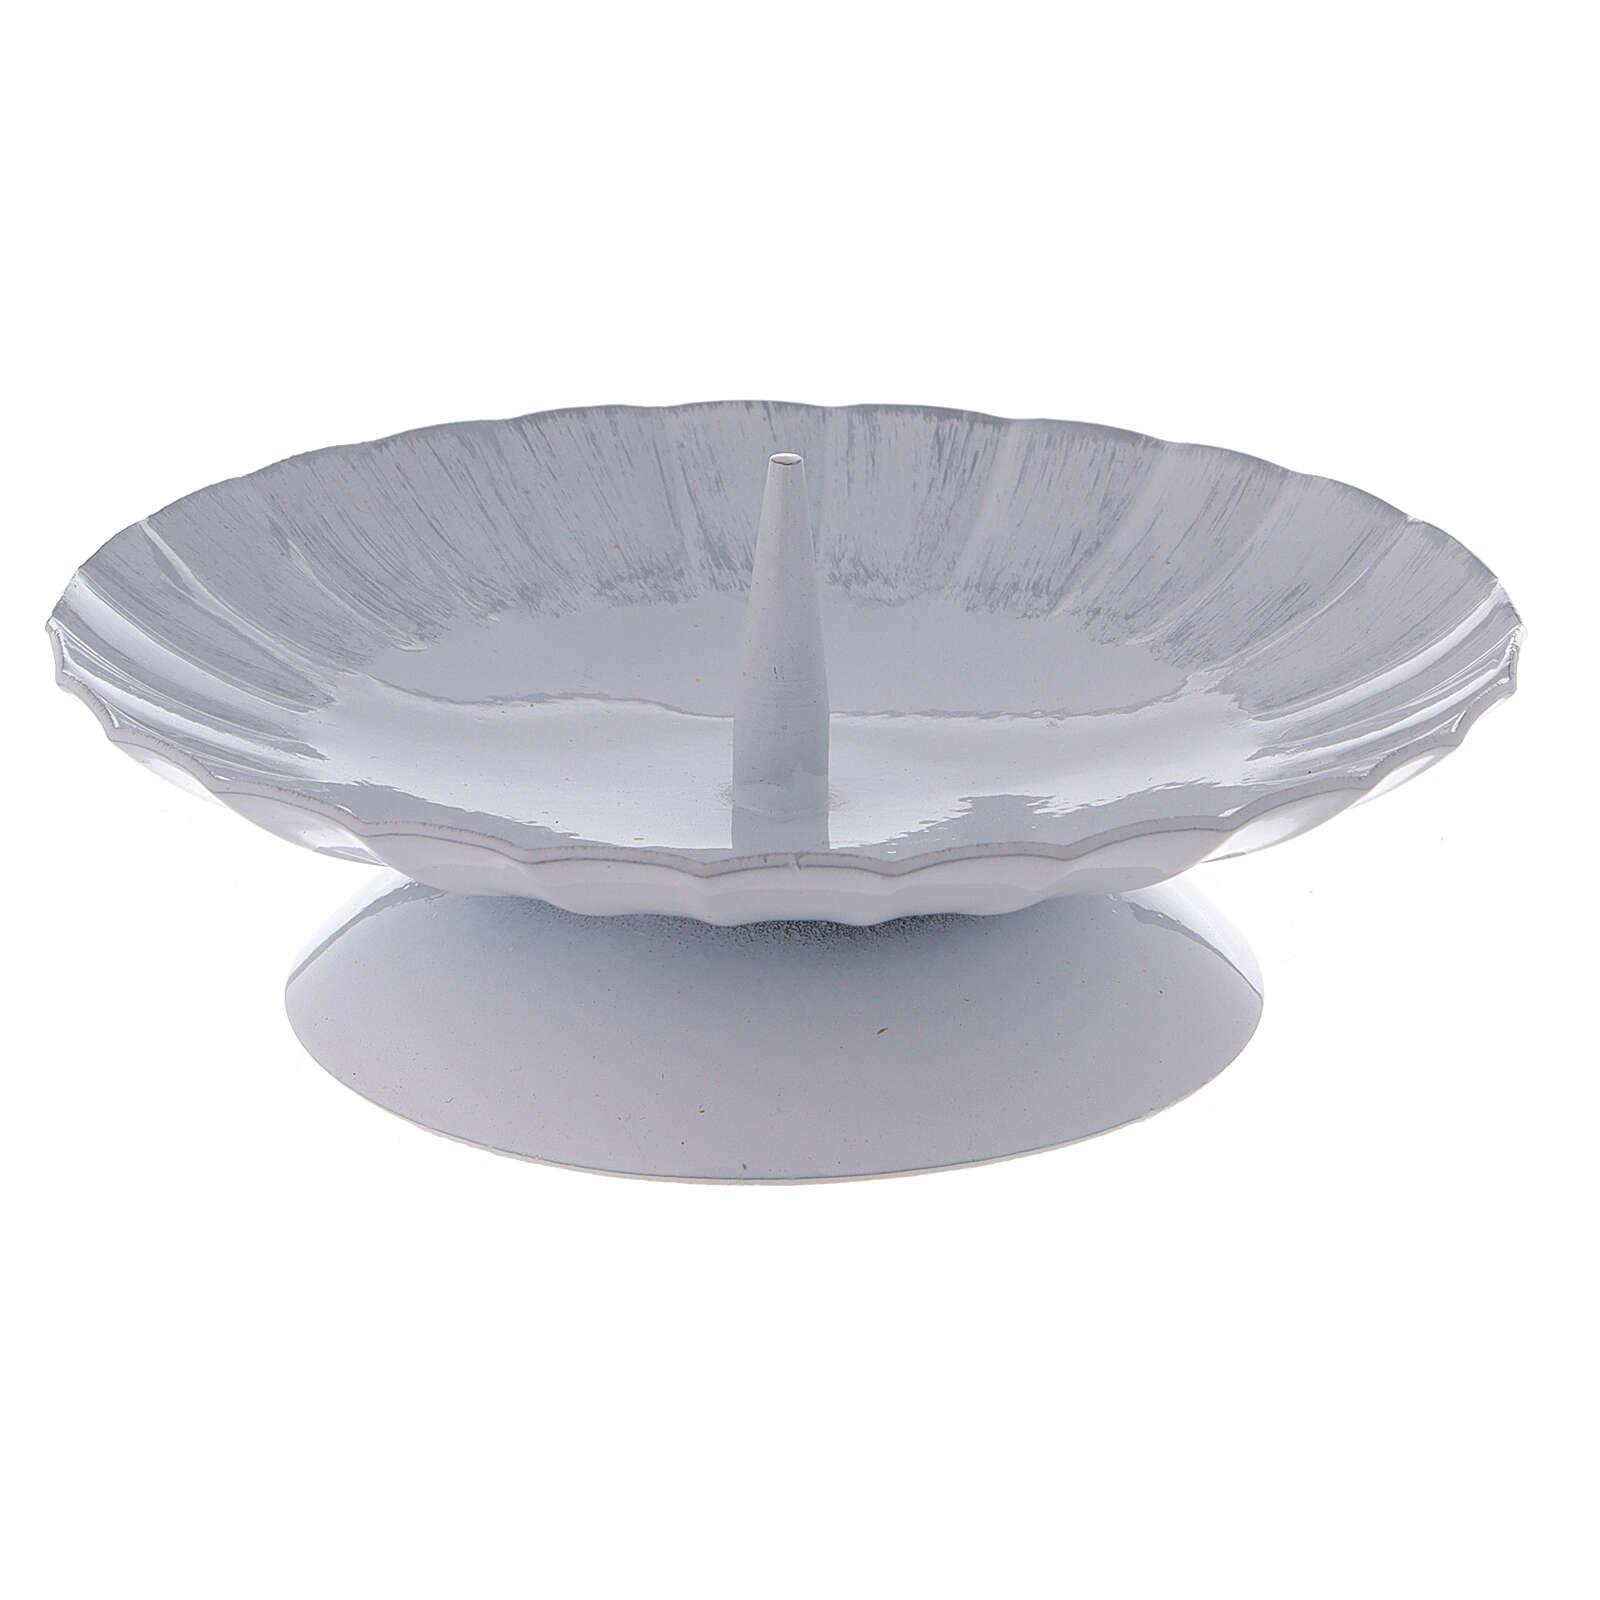 Portacandela con punzone ferro bianco argento d. 12 cm 3